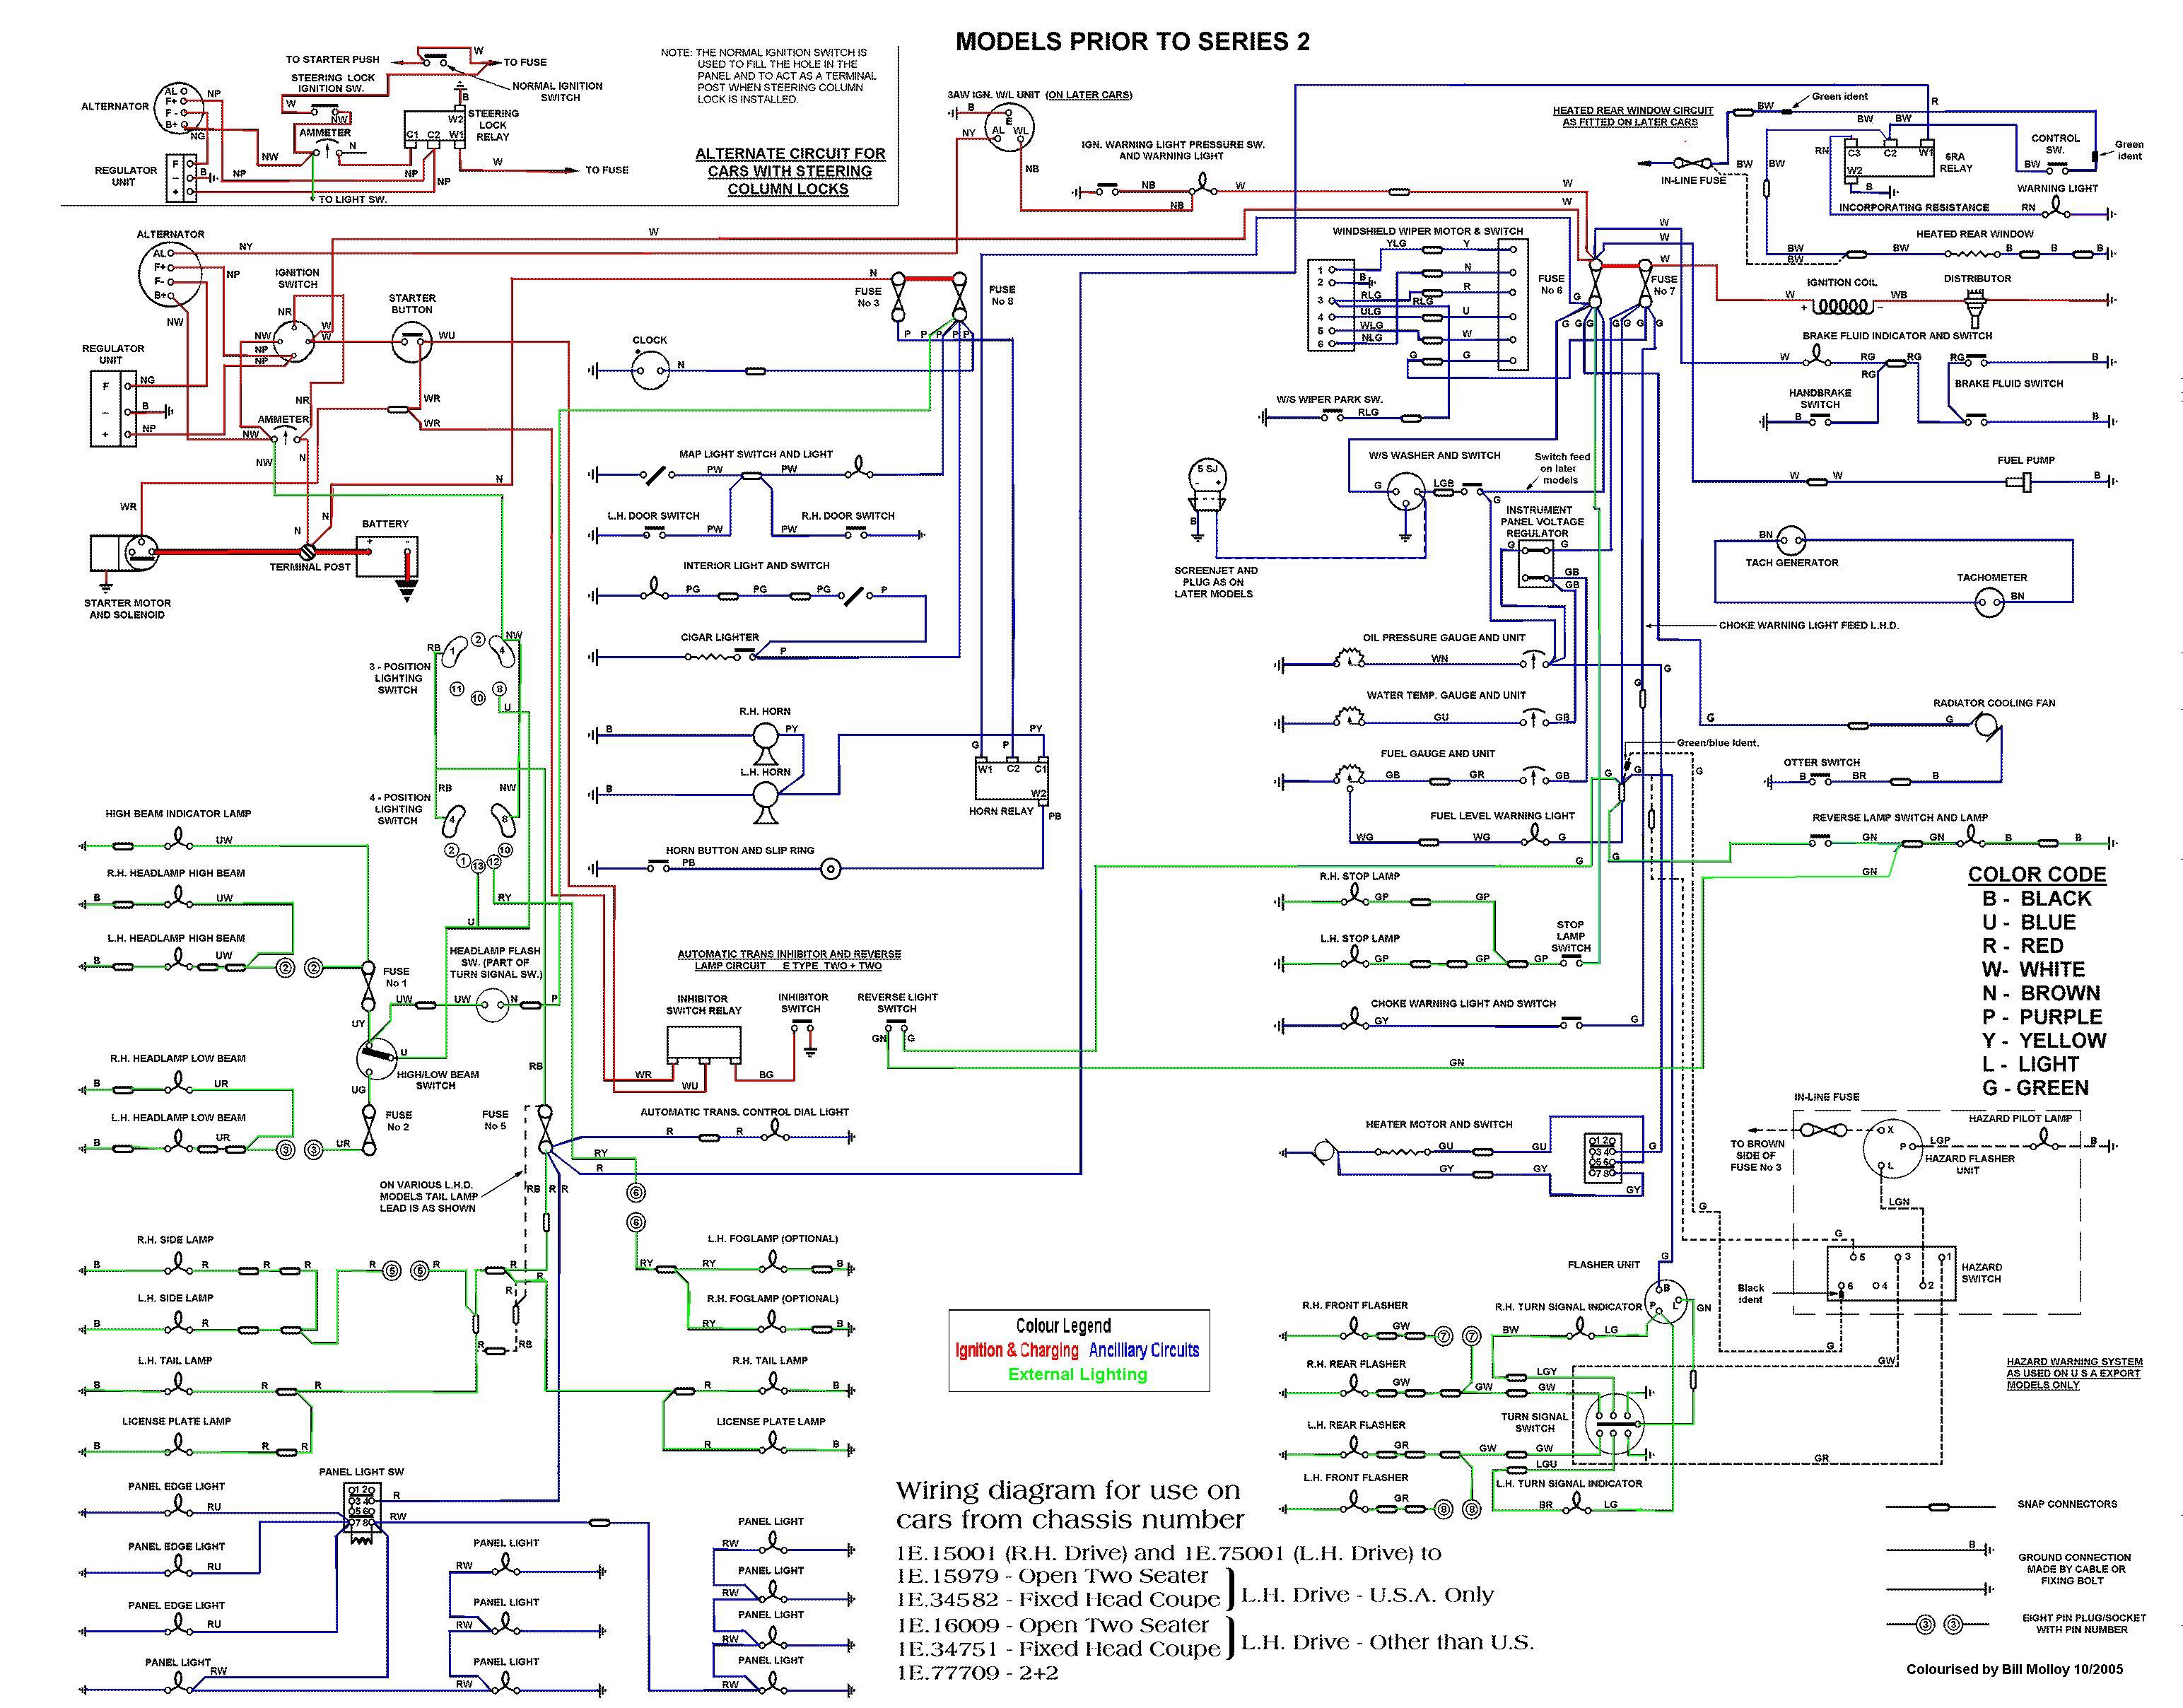 jaguar mk2 wiring diagram - Wiring Diagram and Schematic